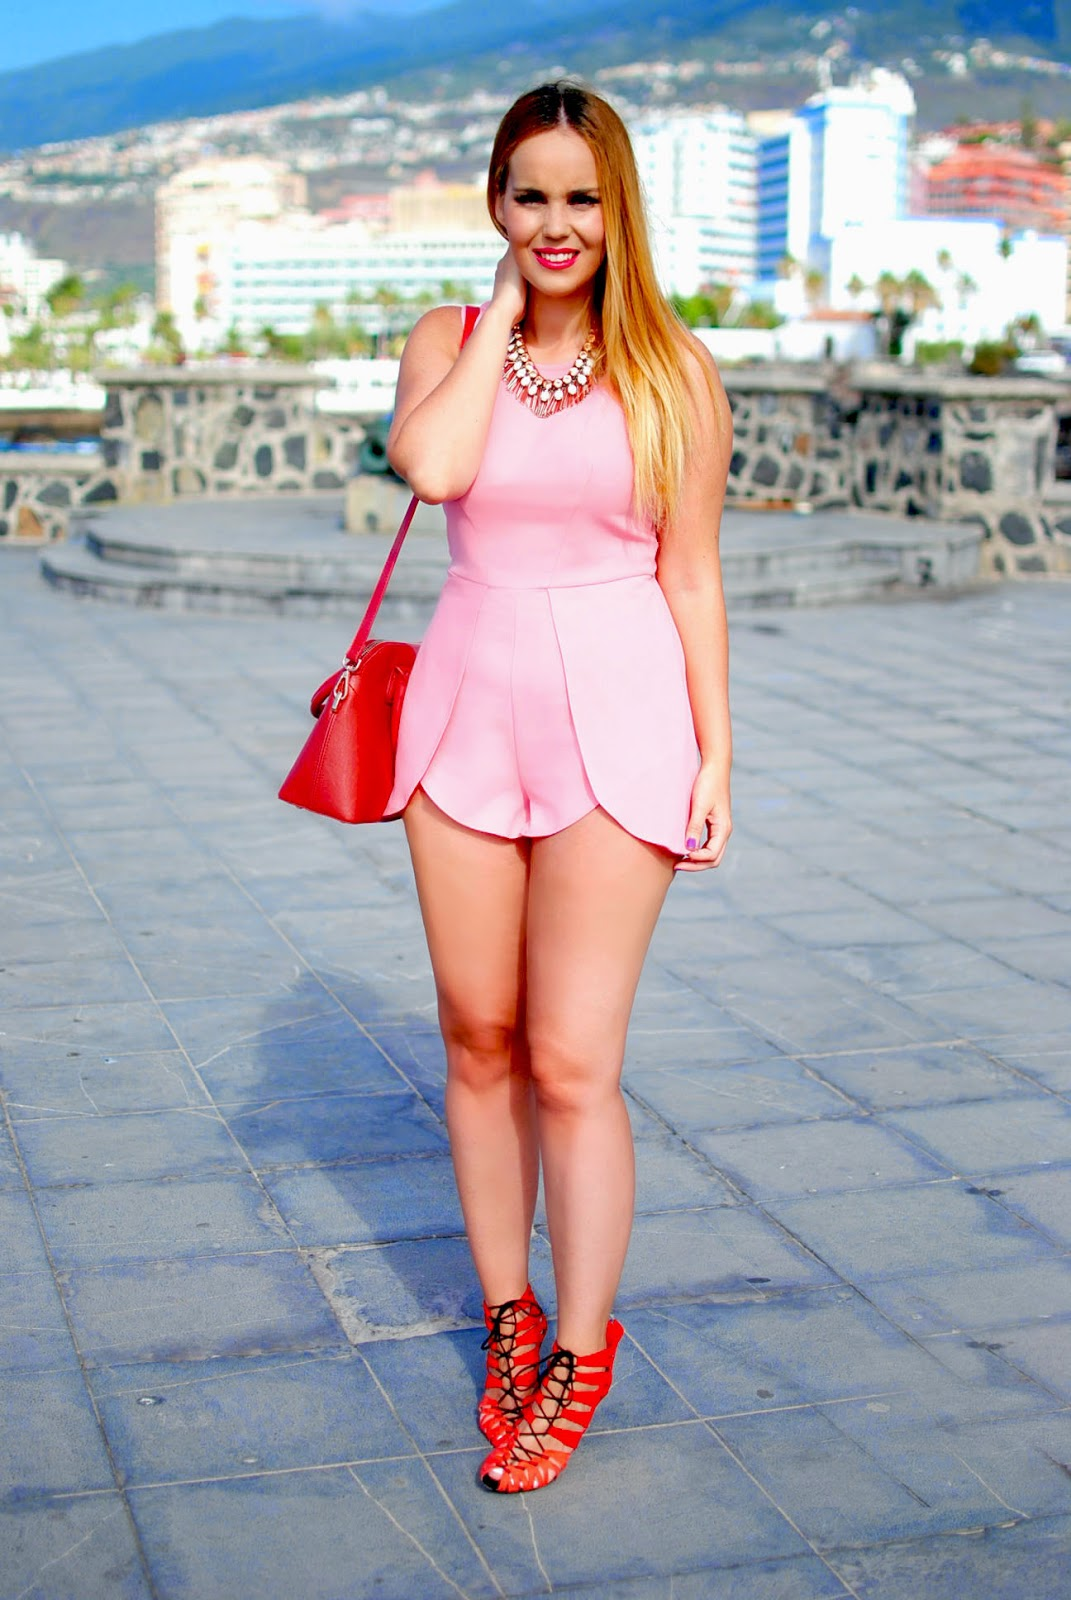 nery hdez, blonde, inlovewithfashion , in love with fashion playsuit, mono corto, ottaviani bujoux